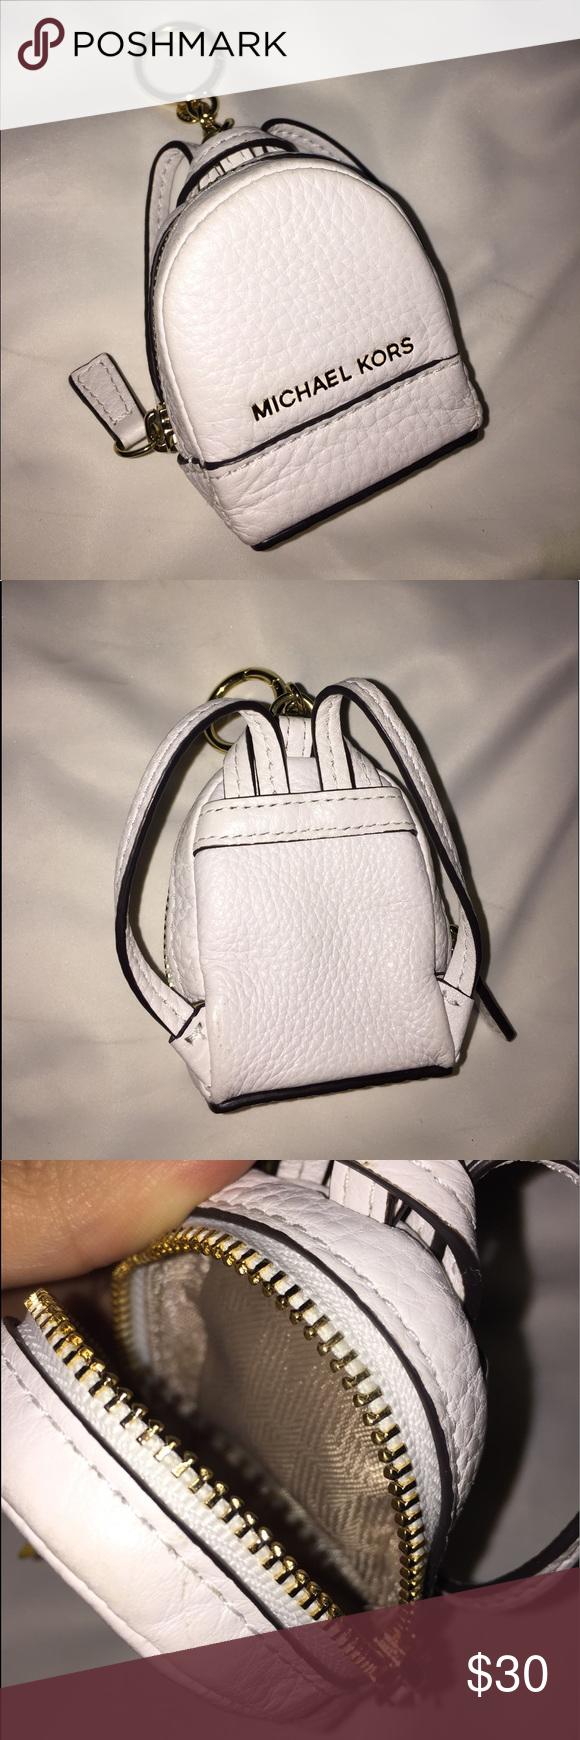 Mk Mini Backpack Keychain - CEAGESP dfb91614cb